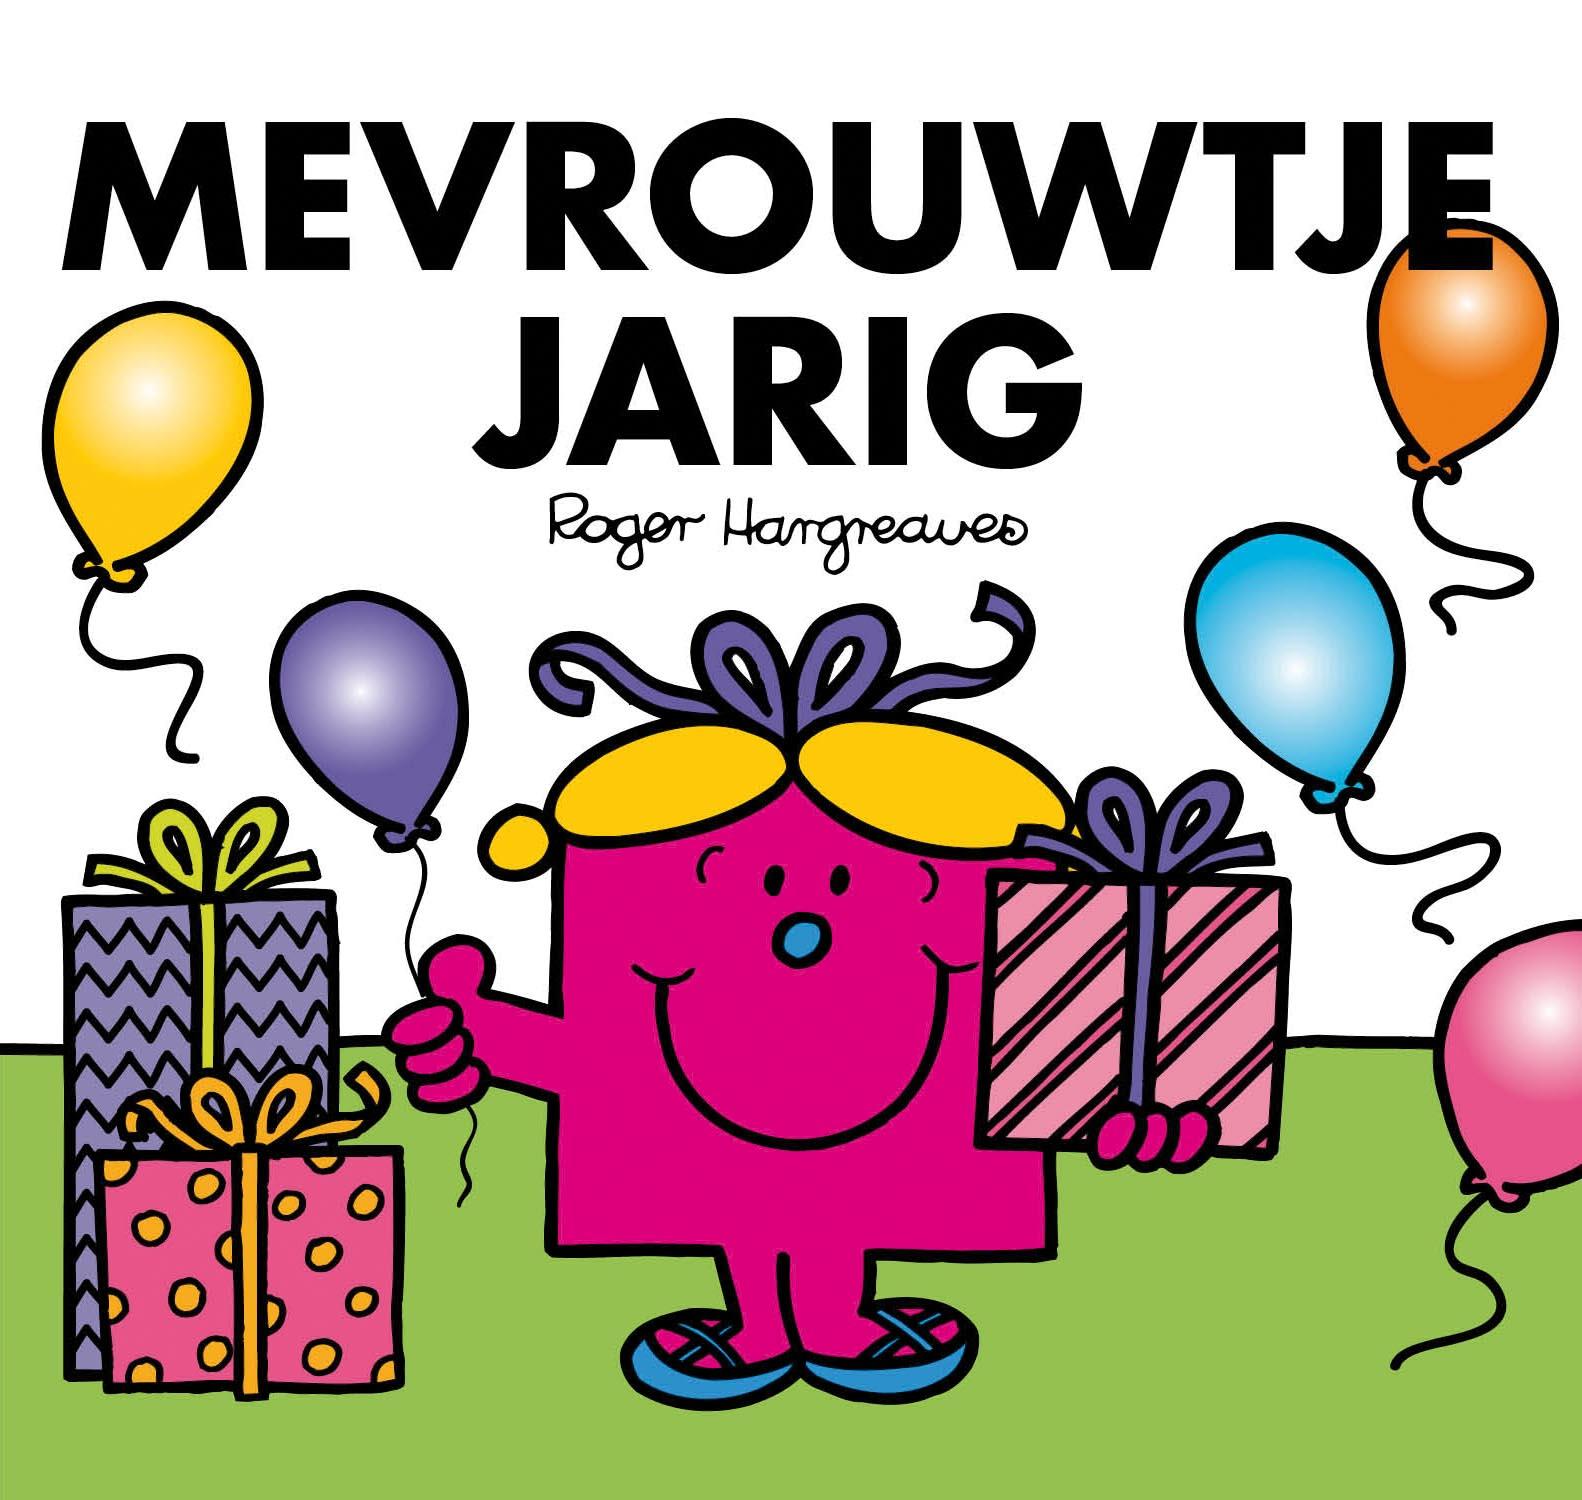 jarig afbeelding Mevrouwtje Jarig | De leukste kinderboeken jarig afbeelding